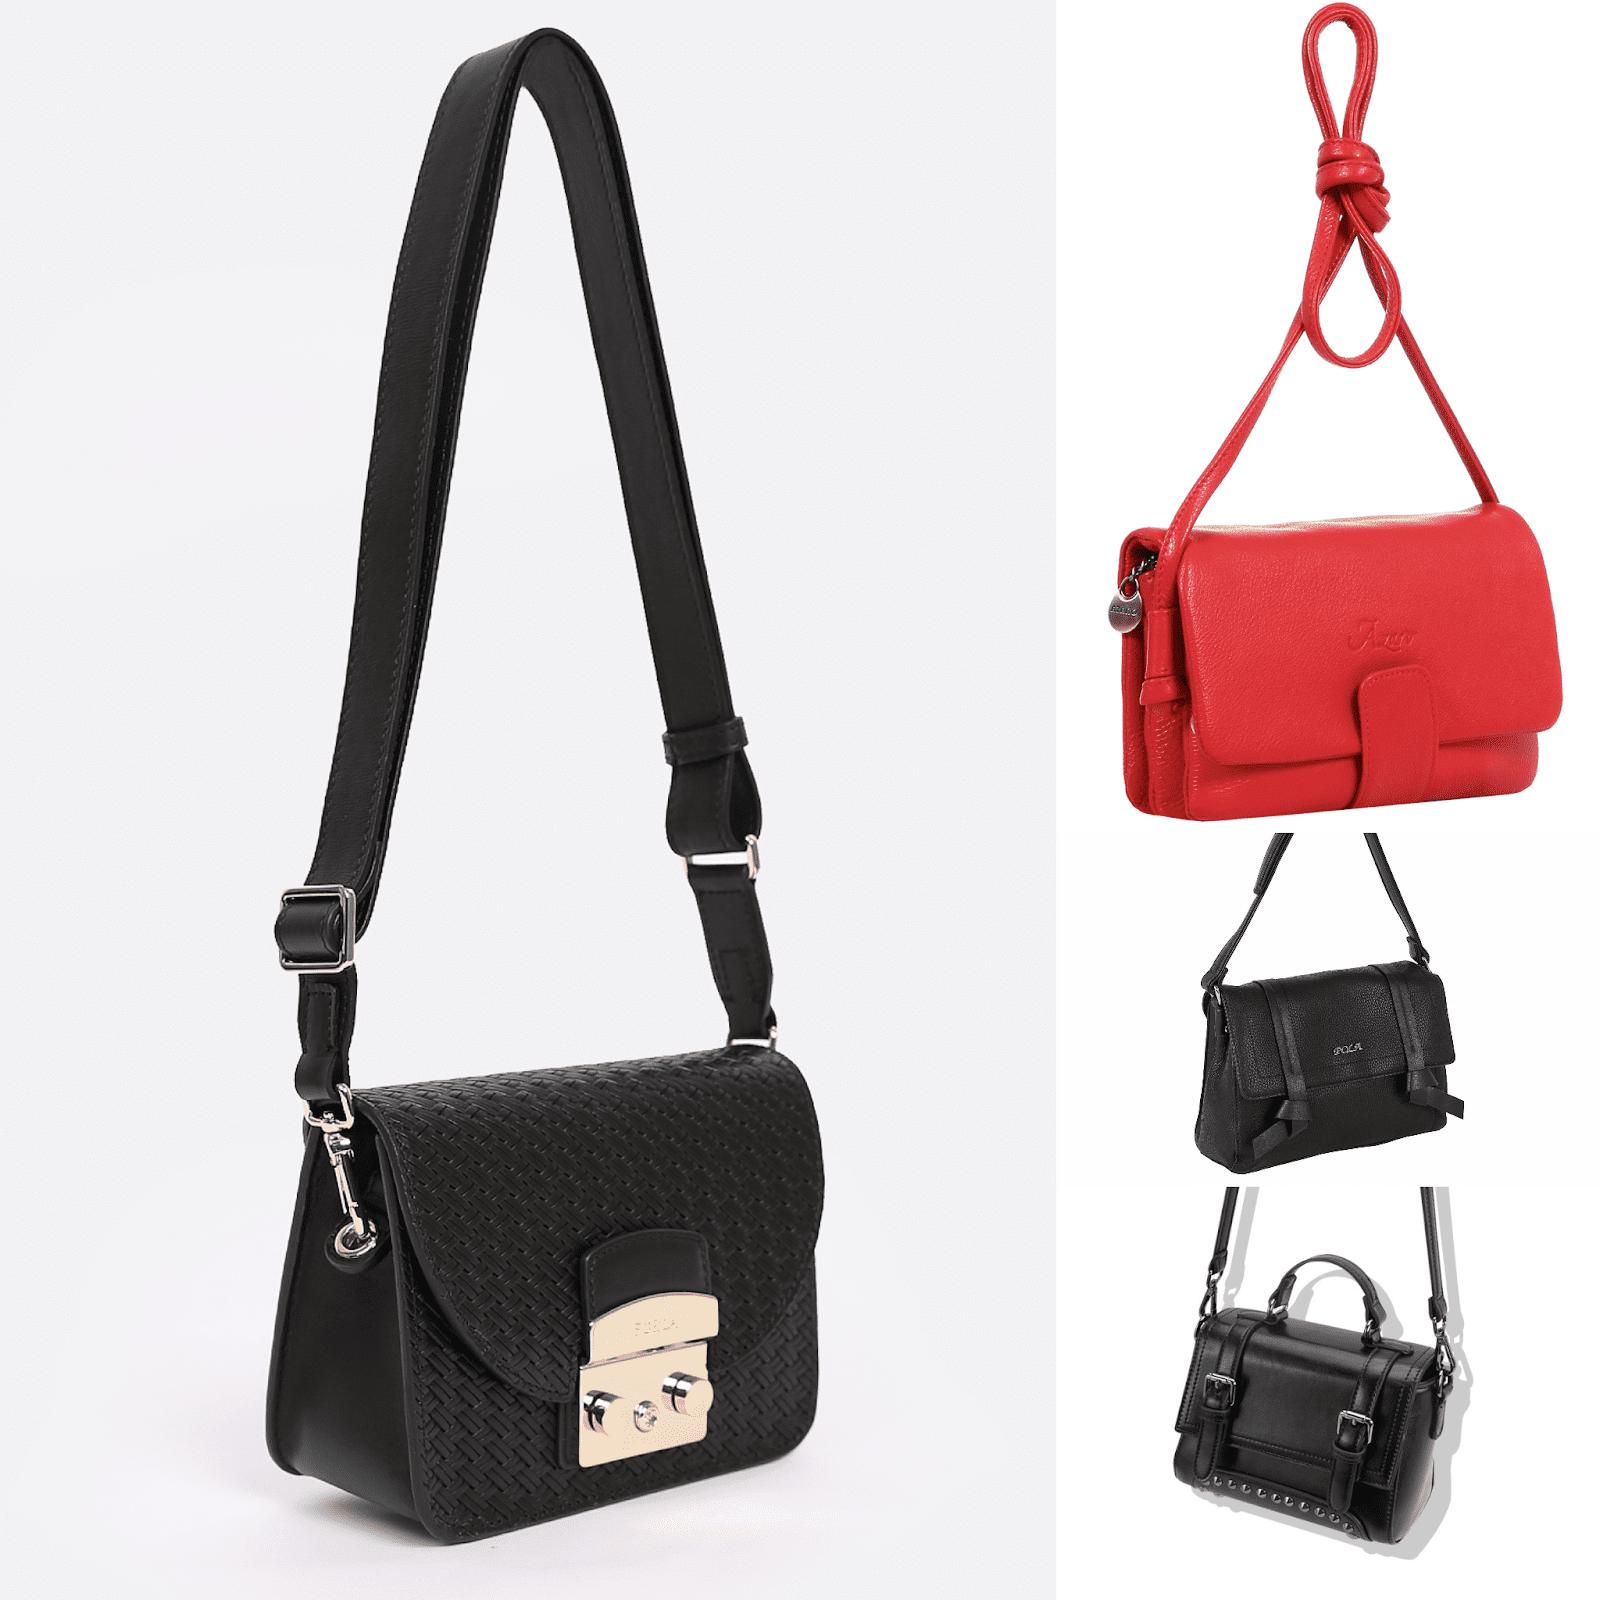 женские сумки интернет магазин